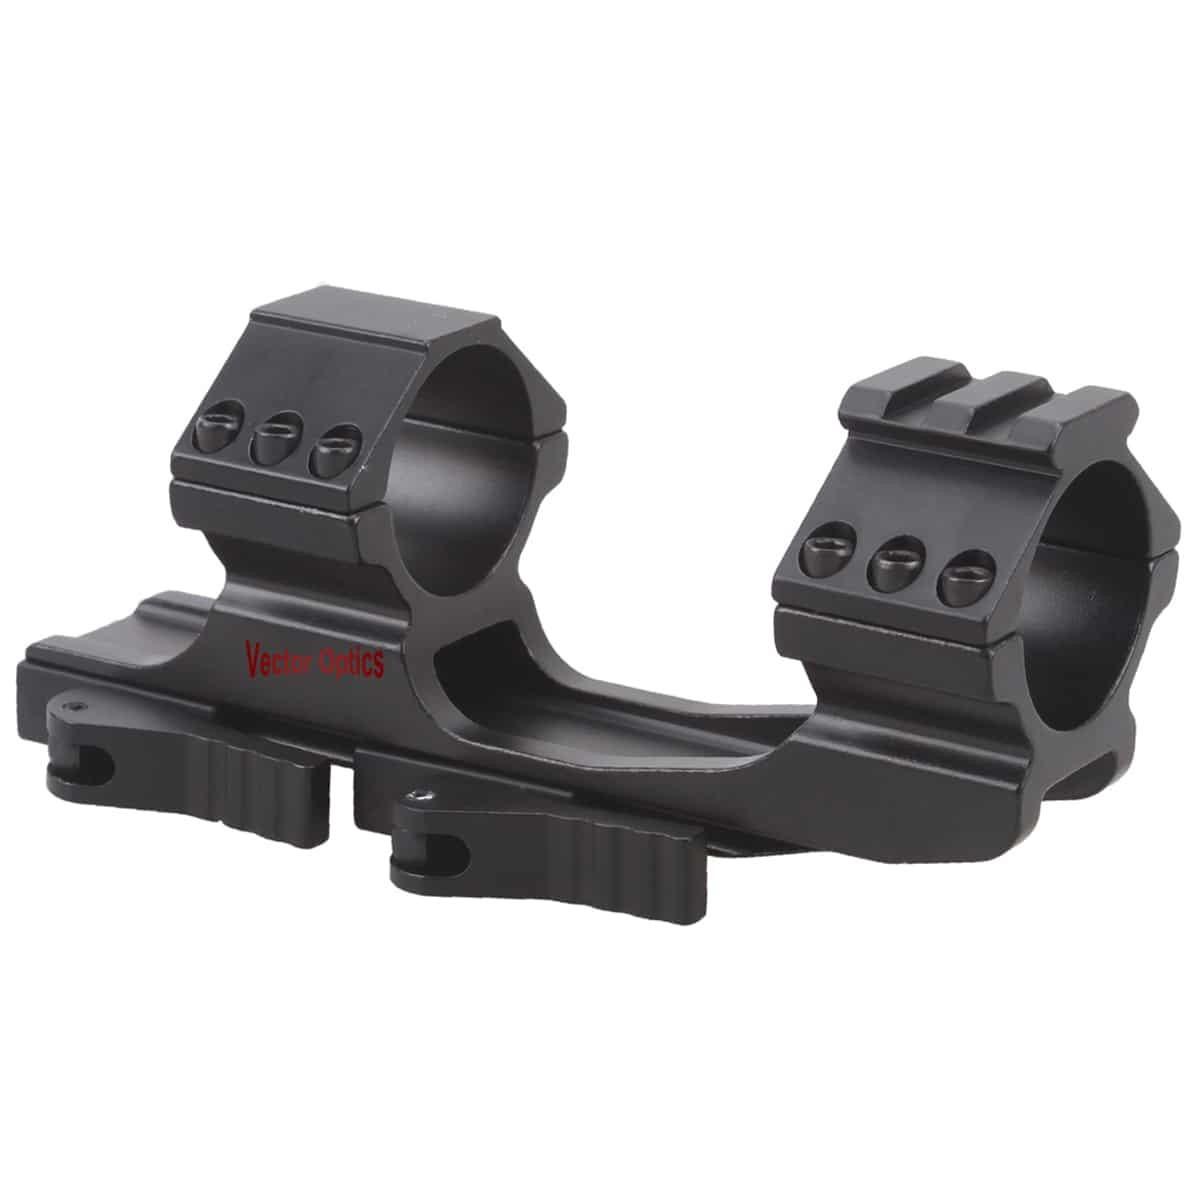 Suporte para luneta Vector Optics 30mm Quick Release Picatinny perfil alto